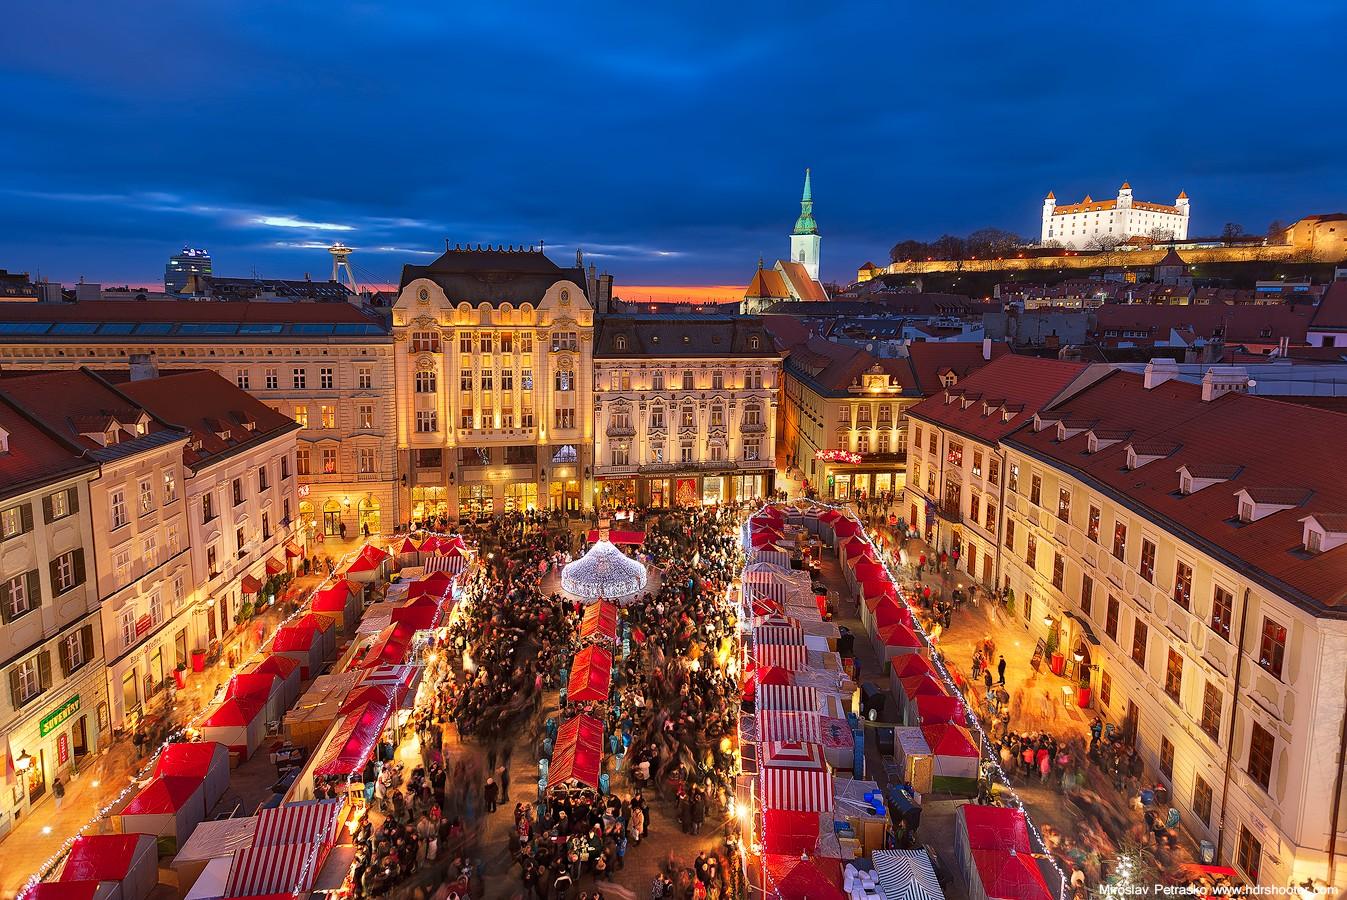 Нужна ли виза россиянам для въезда в Братиславу?